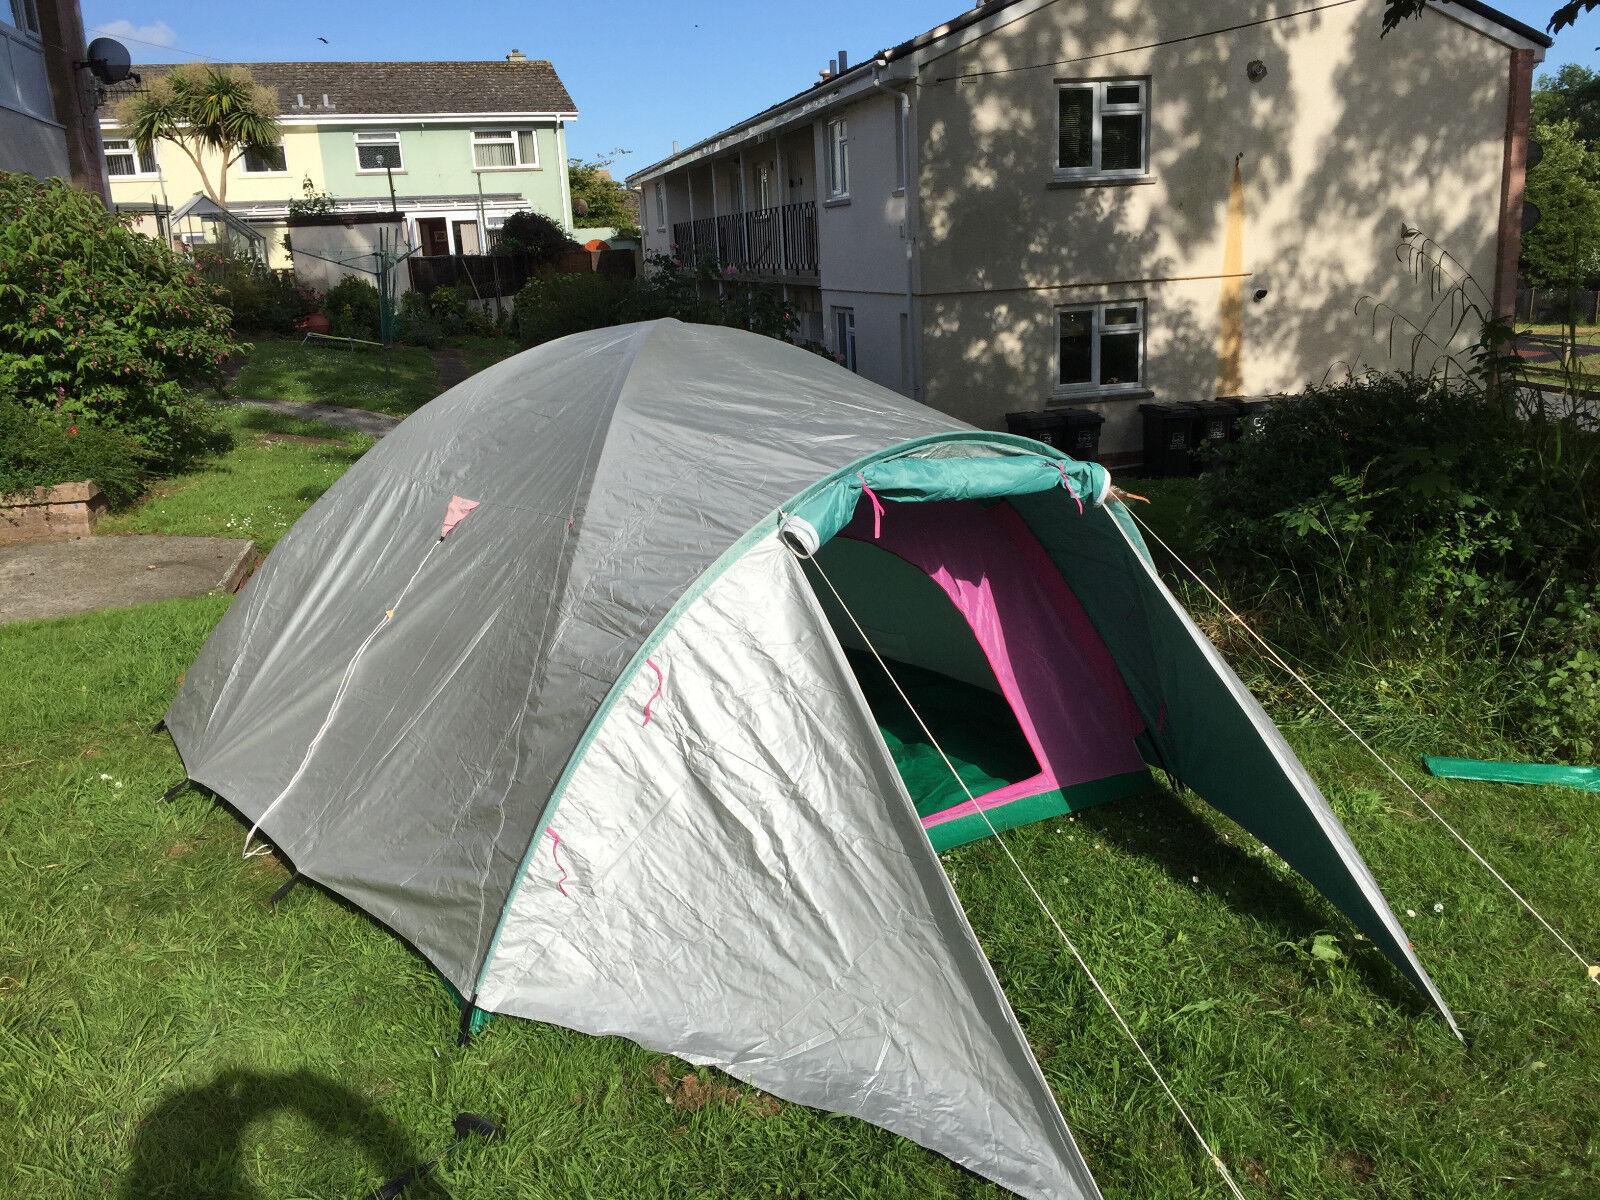 TRIGANO VERDON 5 person tent up to 5 medium Größe Adults Mint Condition